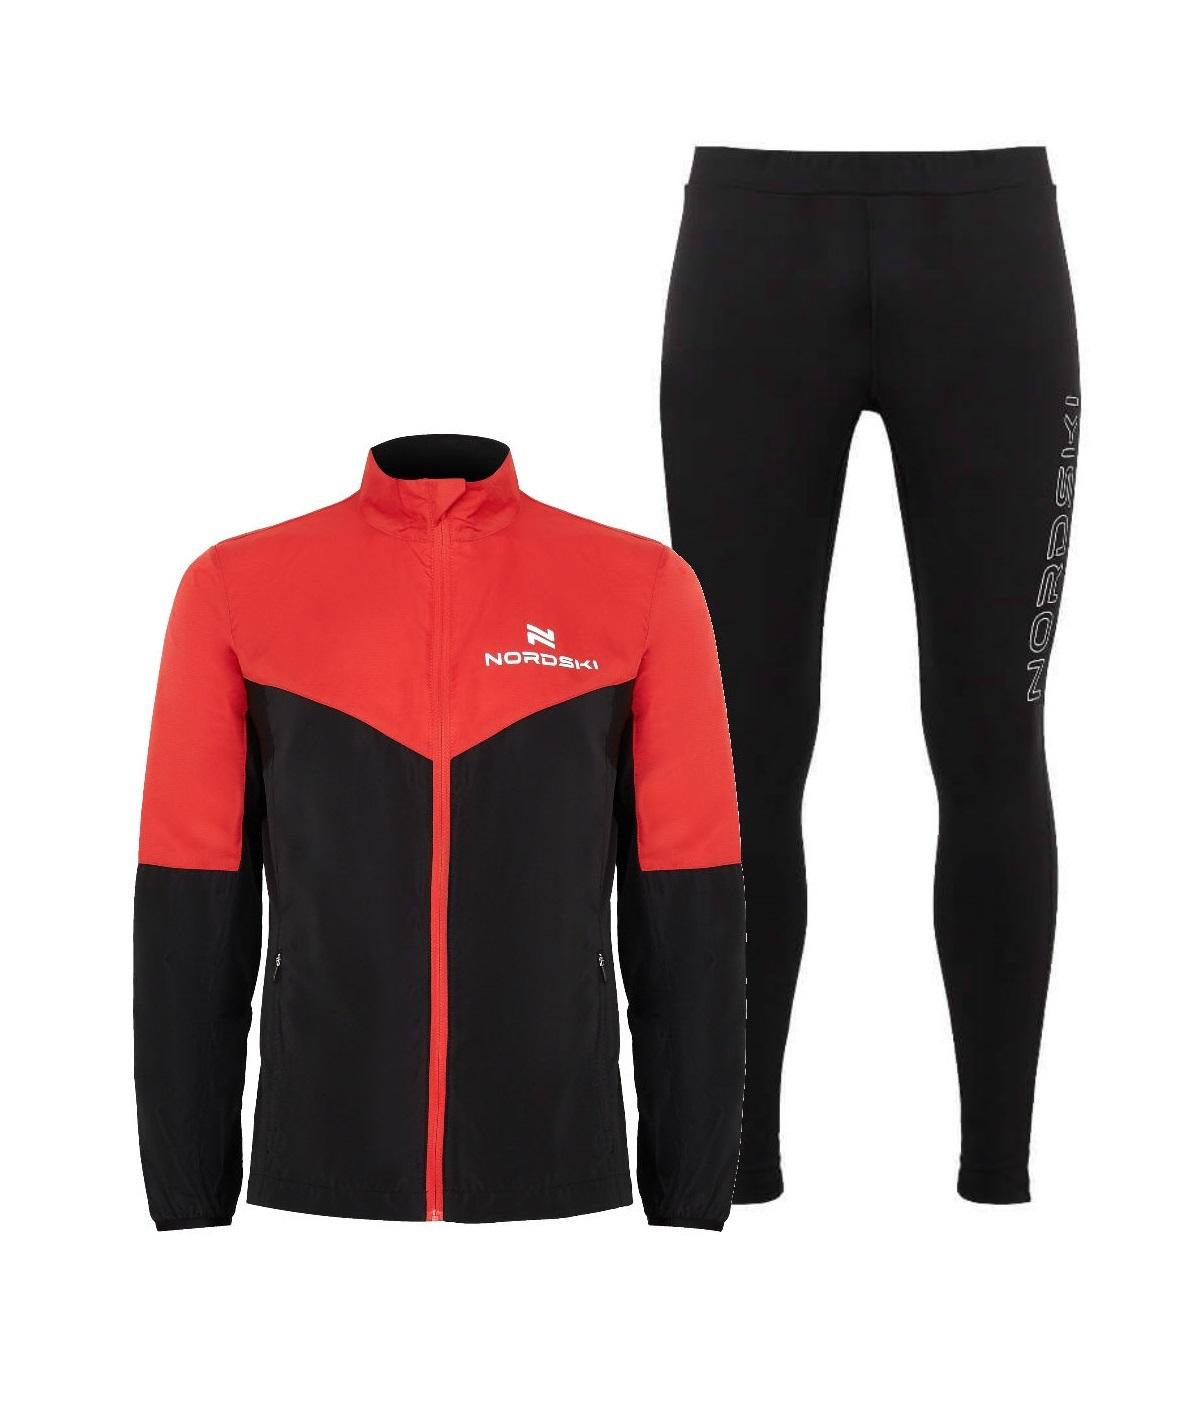 Nordski Sport Elite костюм для бега мужской red-black - 12